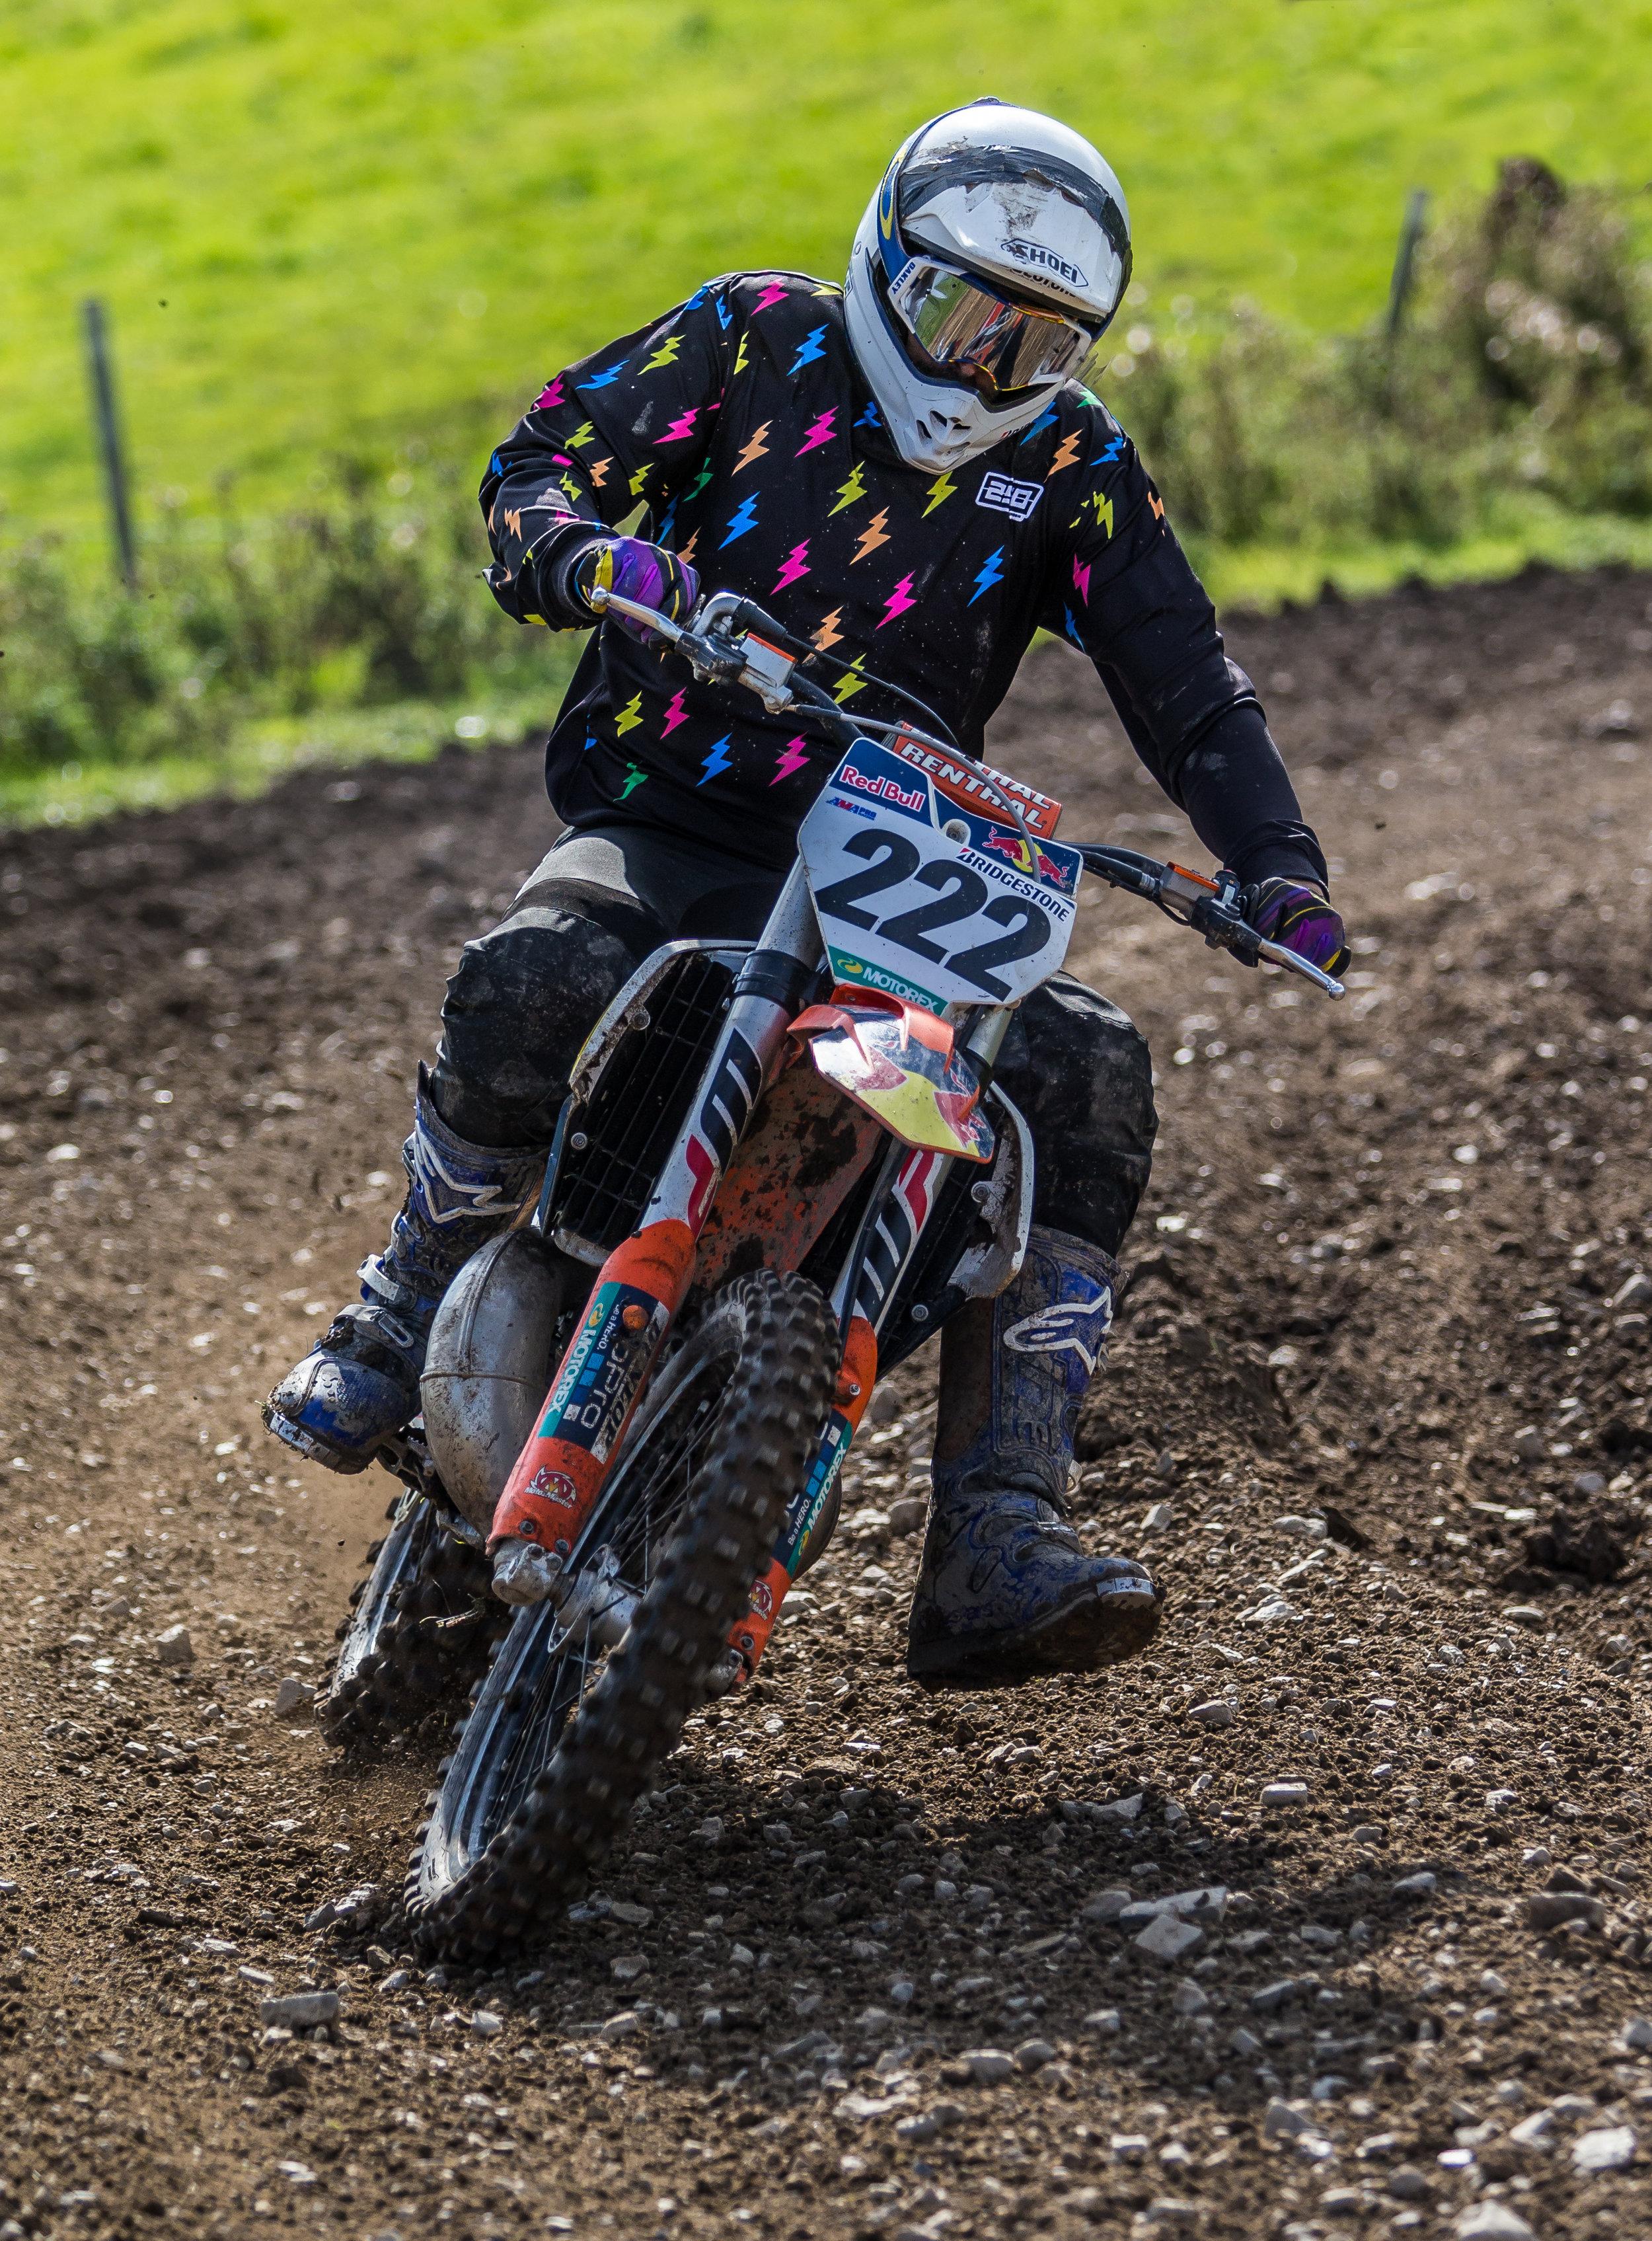 CHRIS CZORA, racing at Brymbo MX